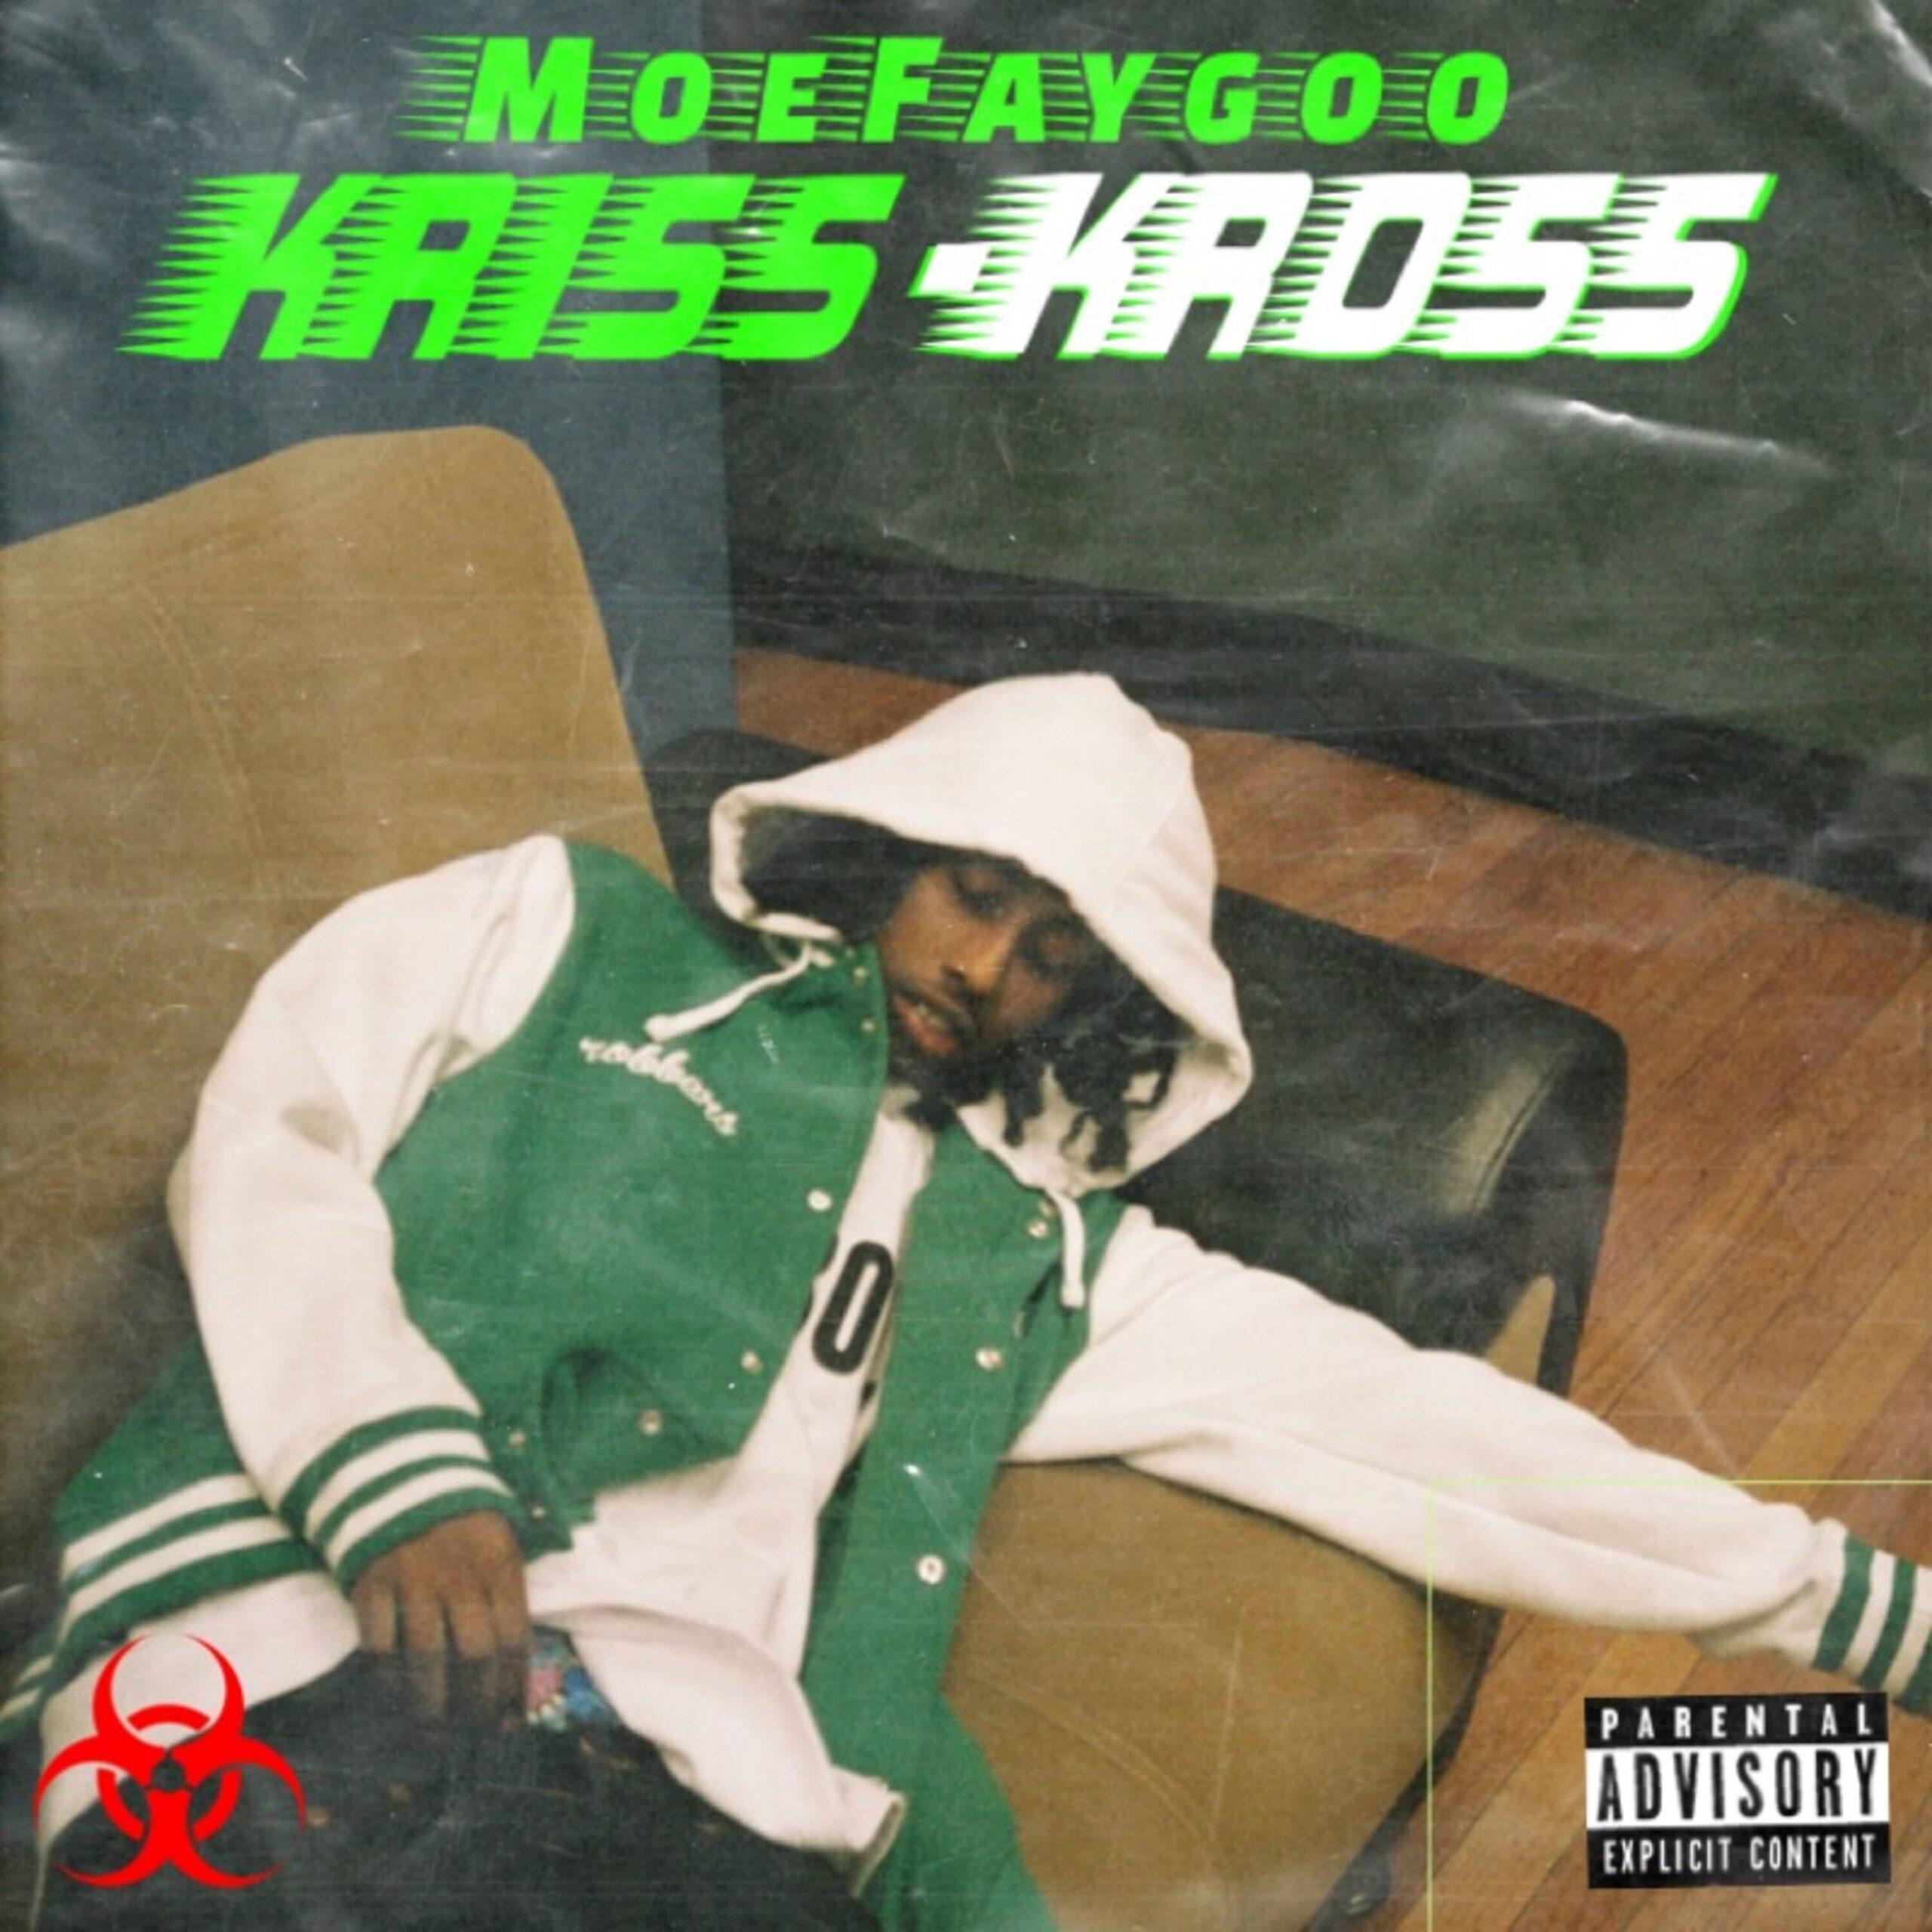 Moe Faygoo